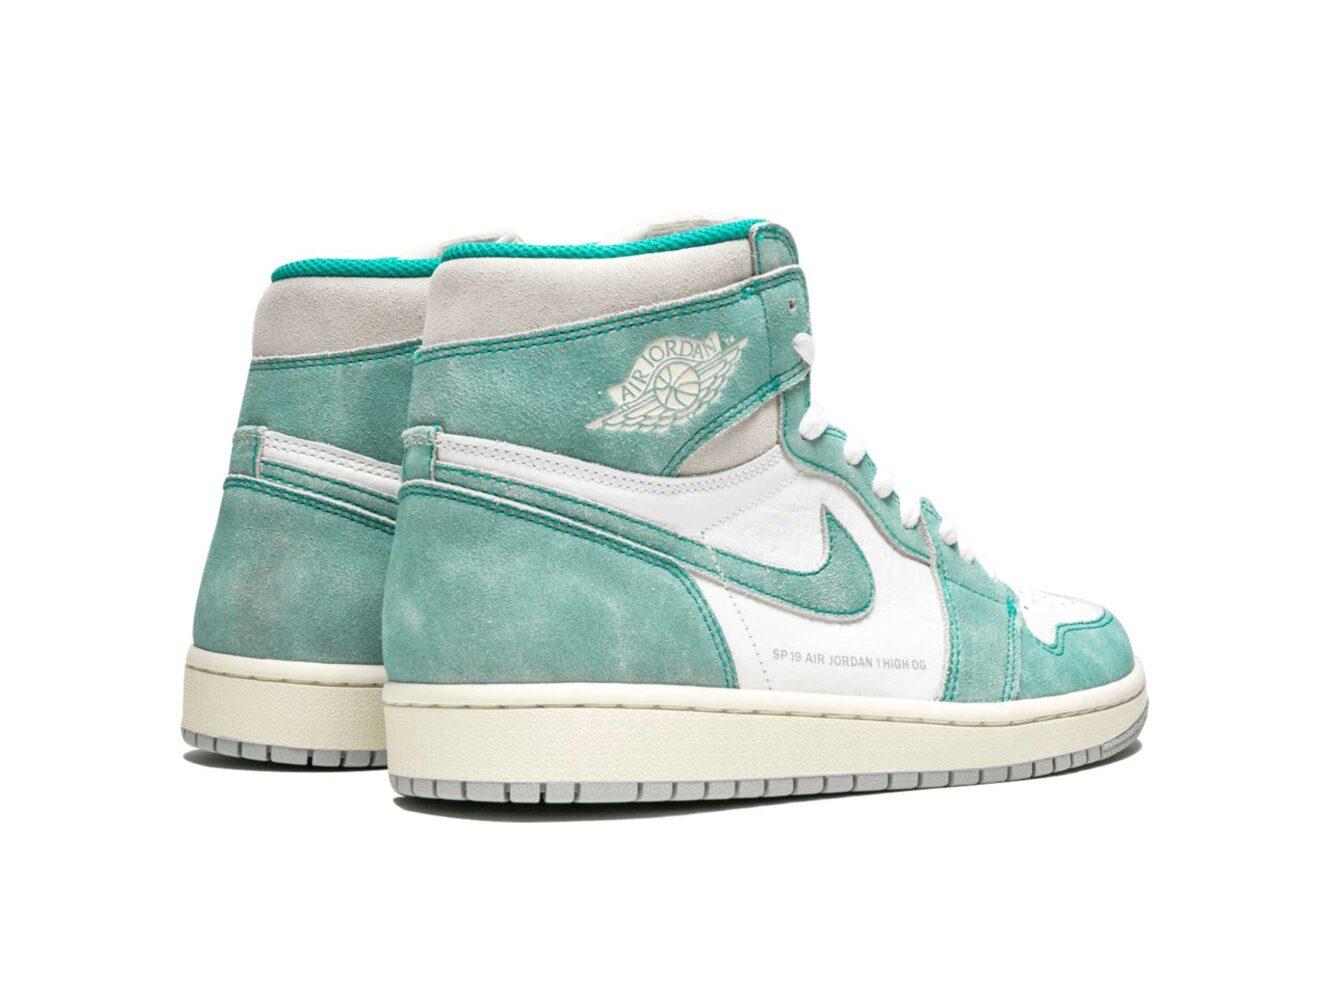 nike air Jordan 1 retro high og turbo green 555088_311 купить